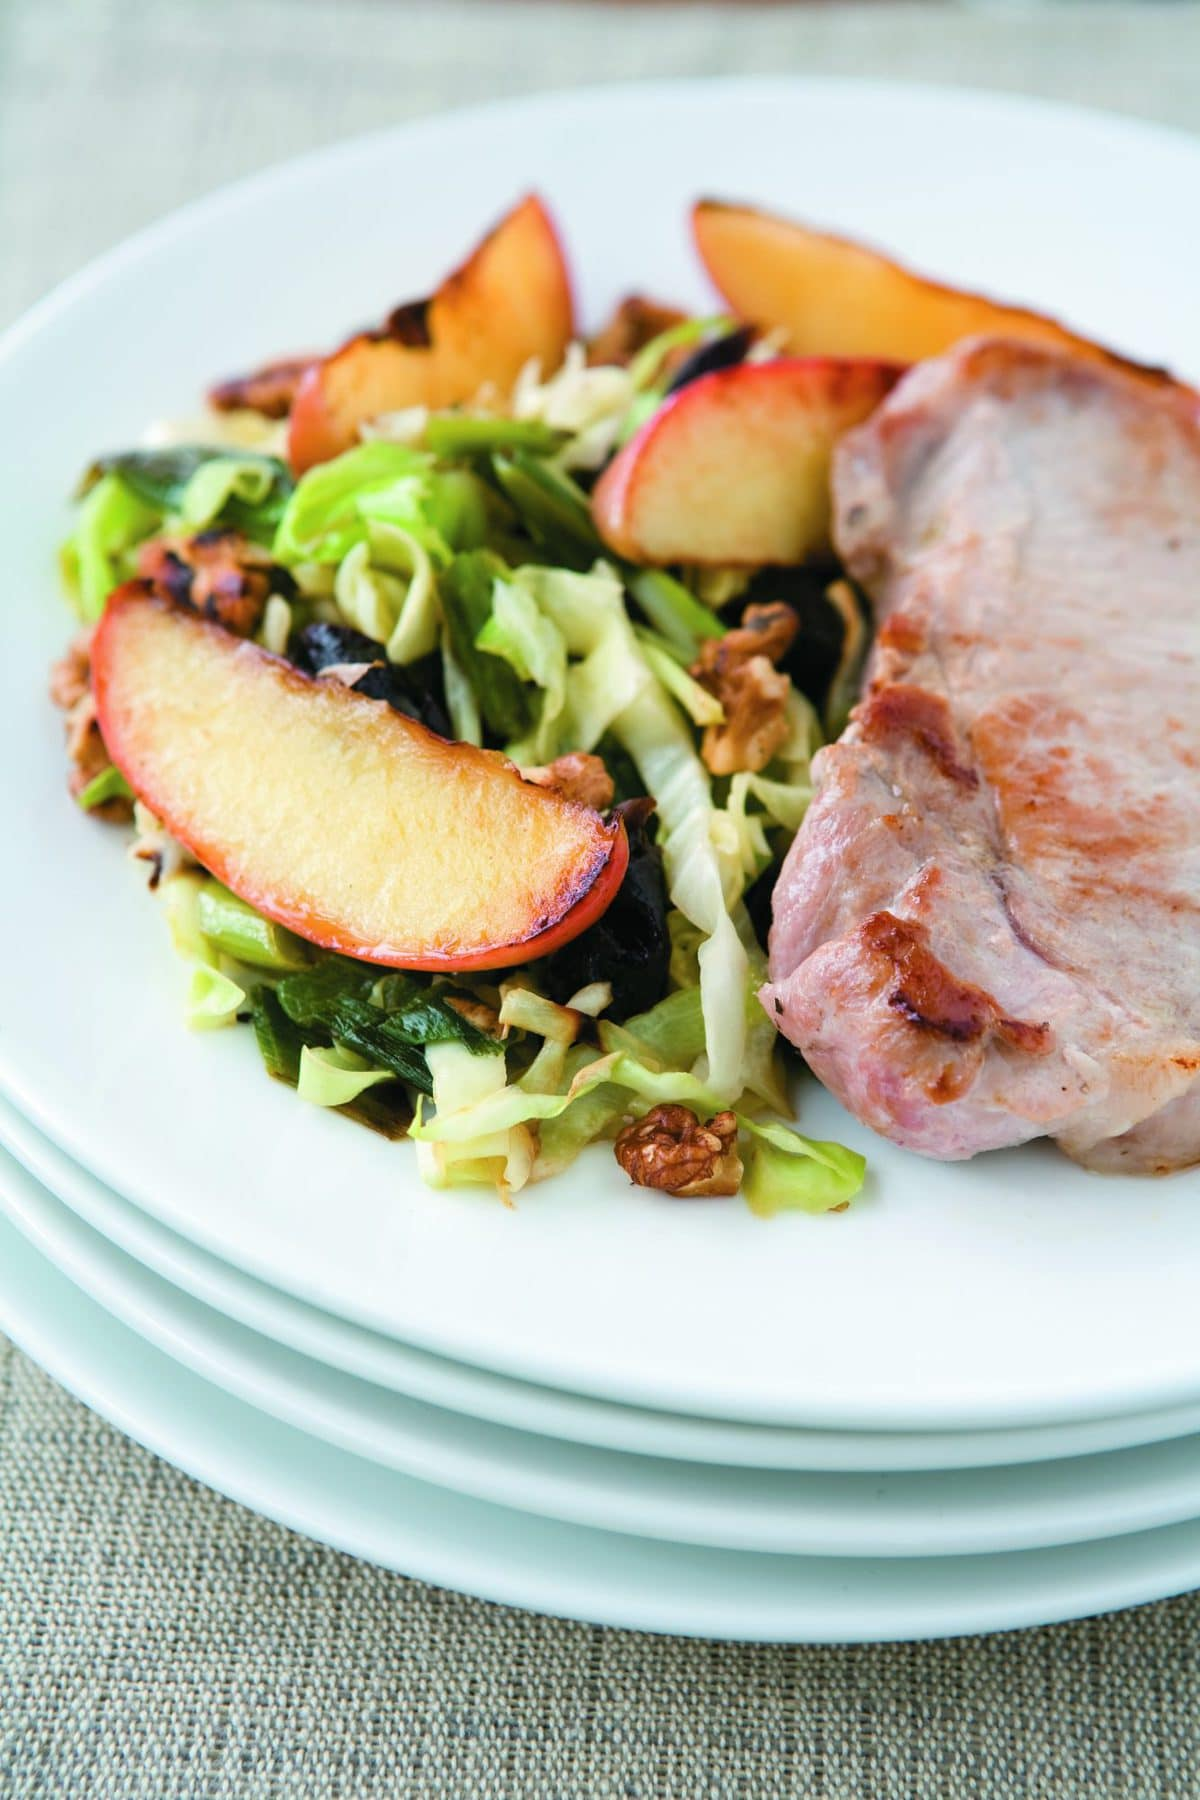 Pork steaks with apple and walnut slaw